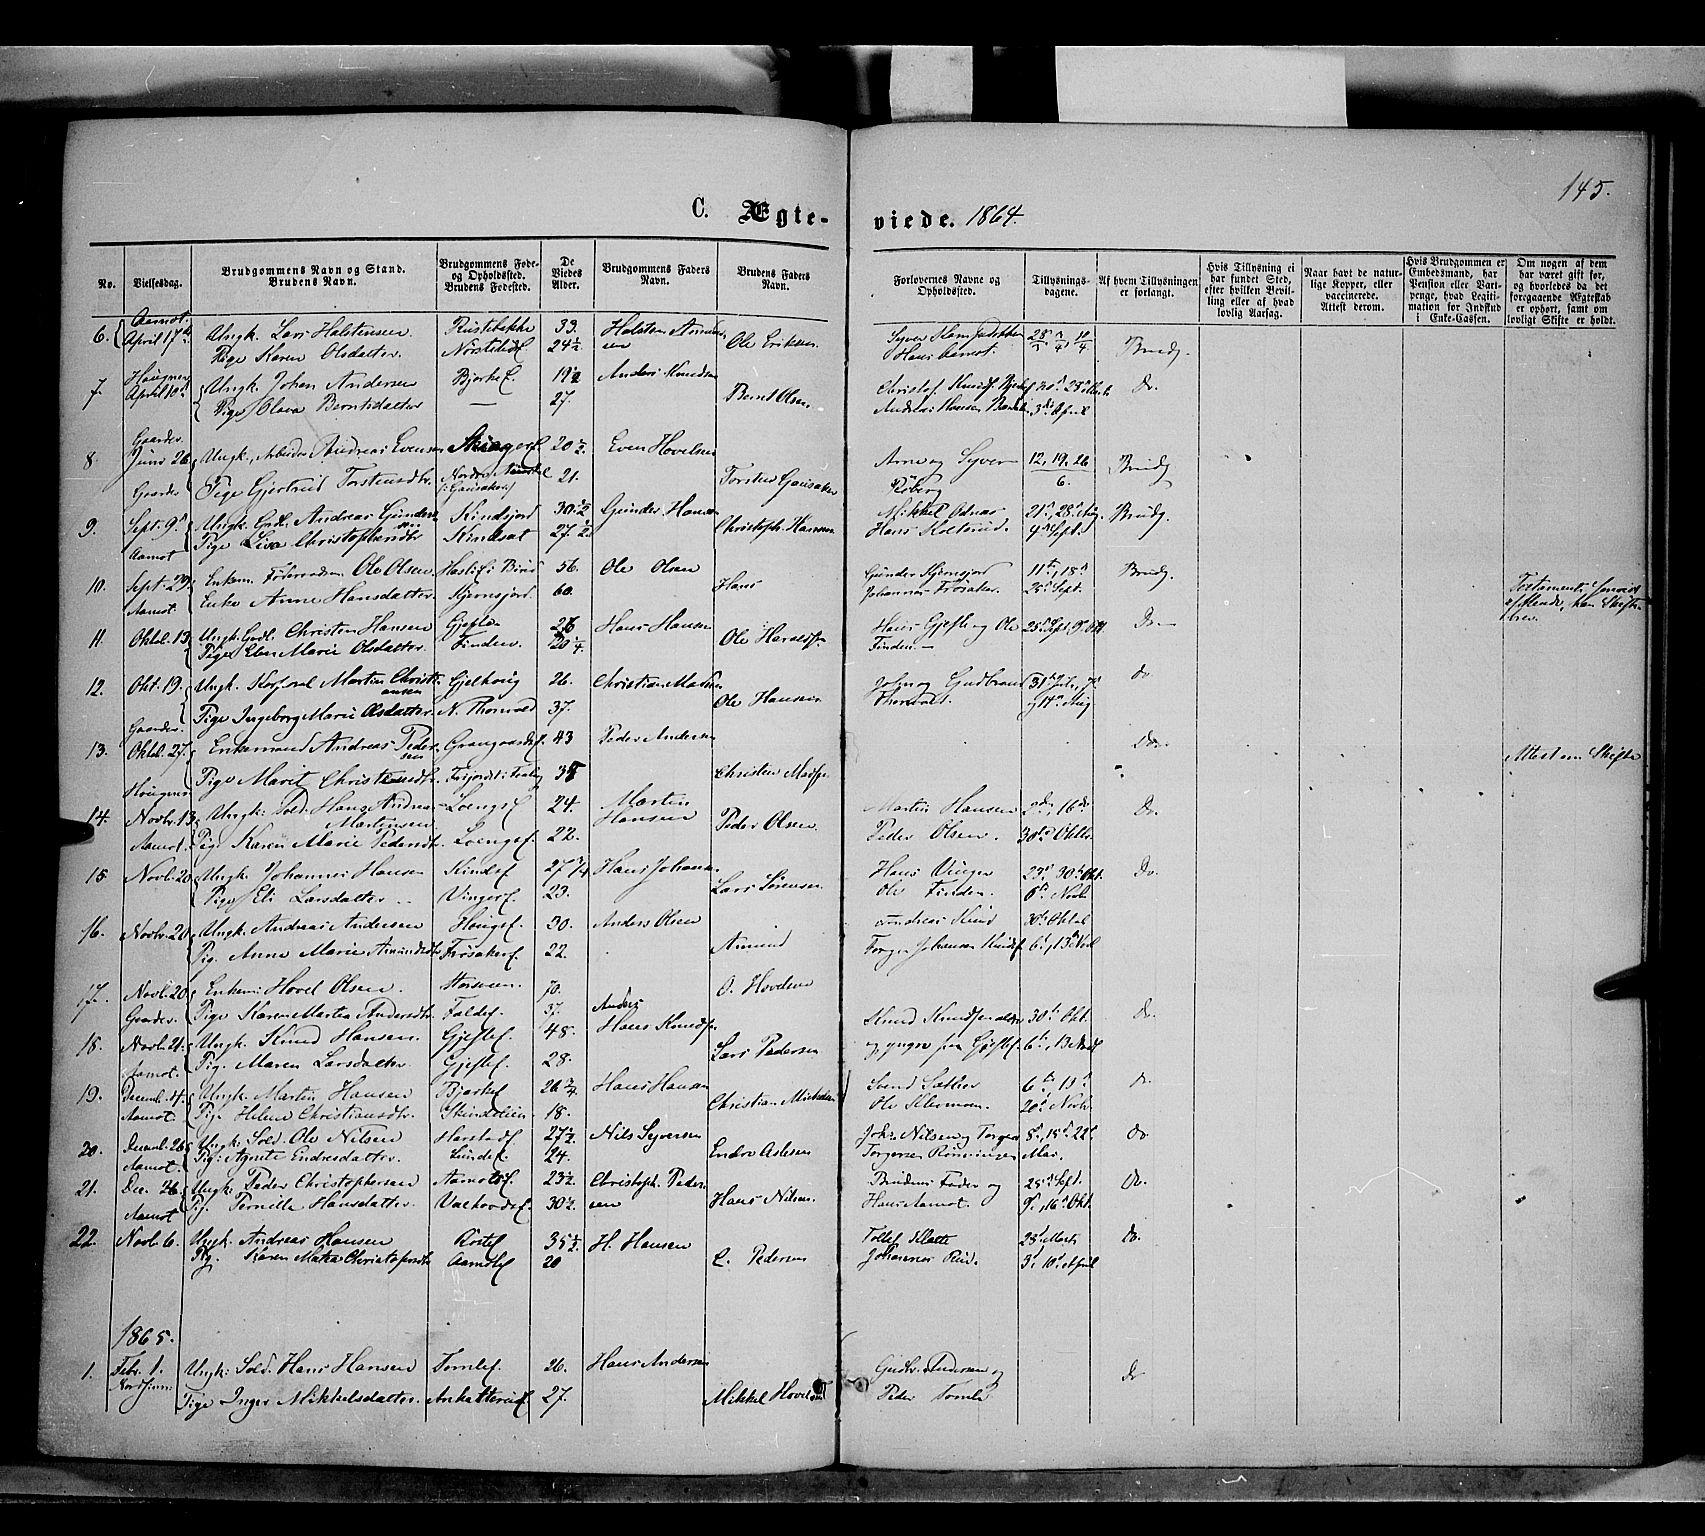 SAH, Nordre Land prestekontor, Ministerialbok nr. 1, 1860-1871, s. 145